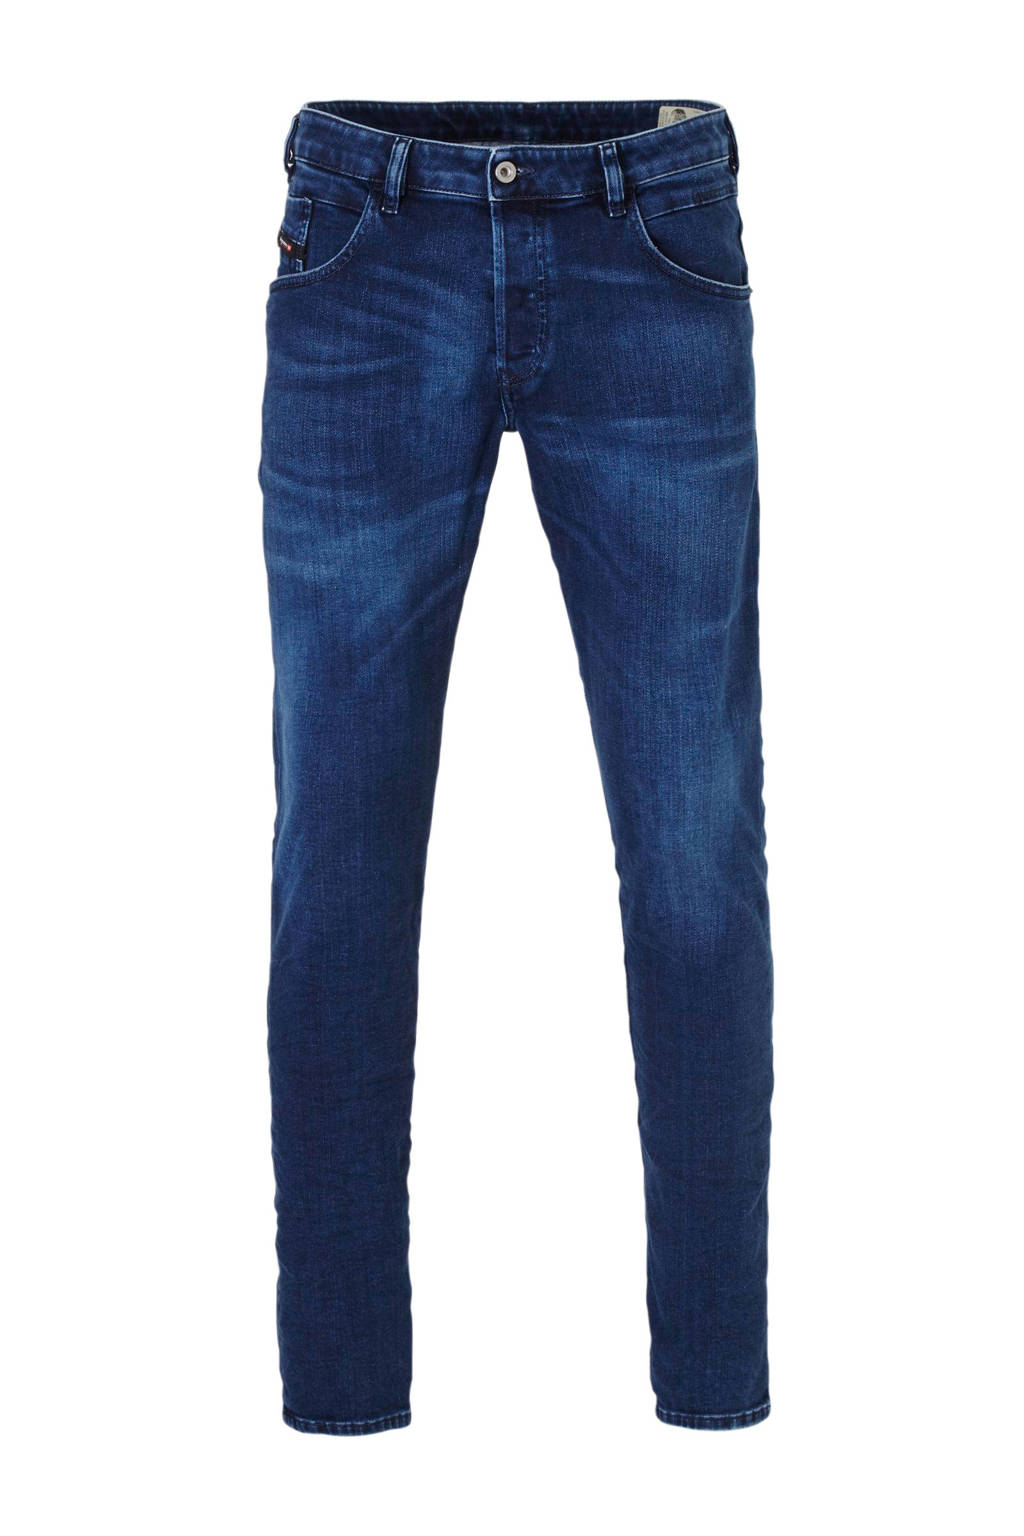 Diesel tapered fit jeans D-Bazer, 1 Blauw